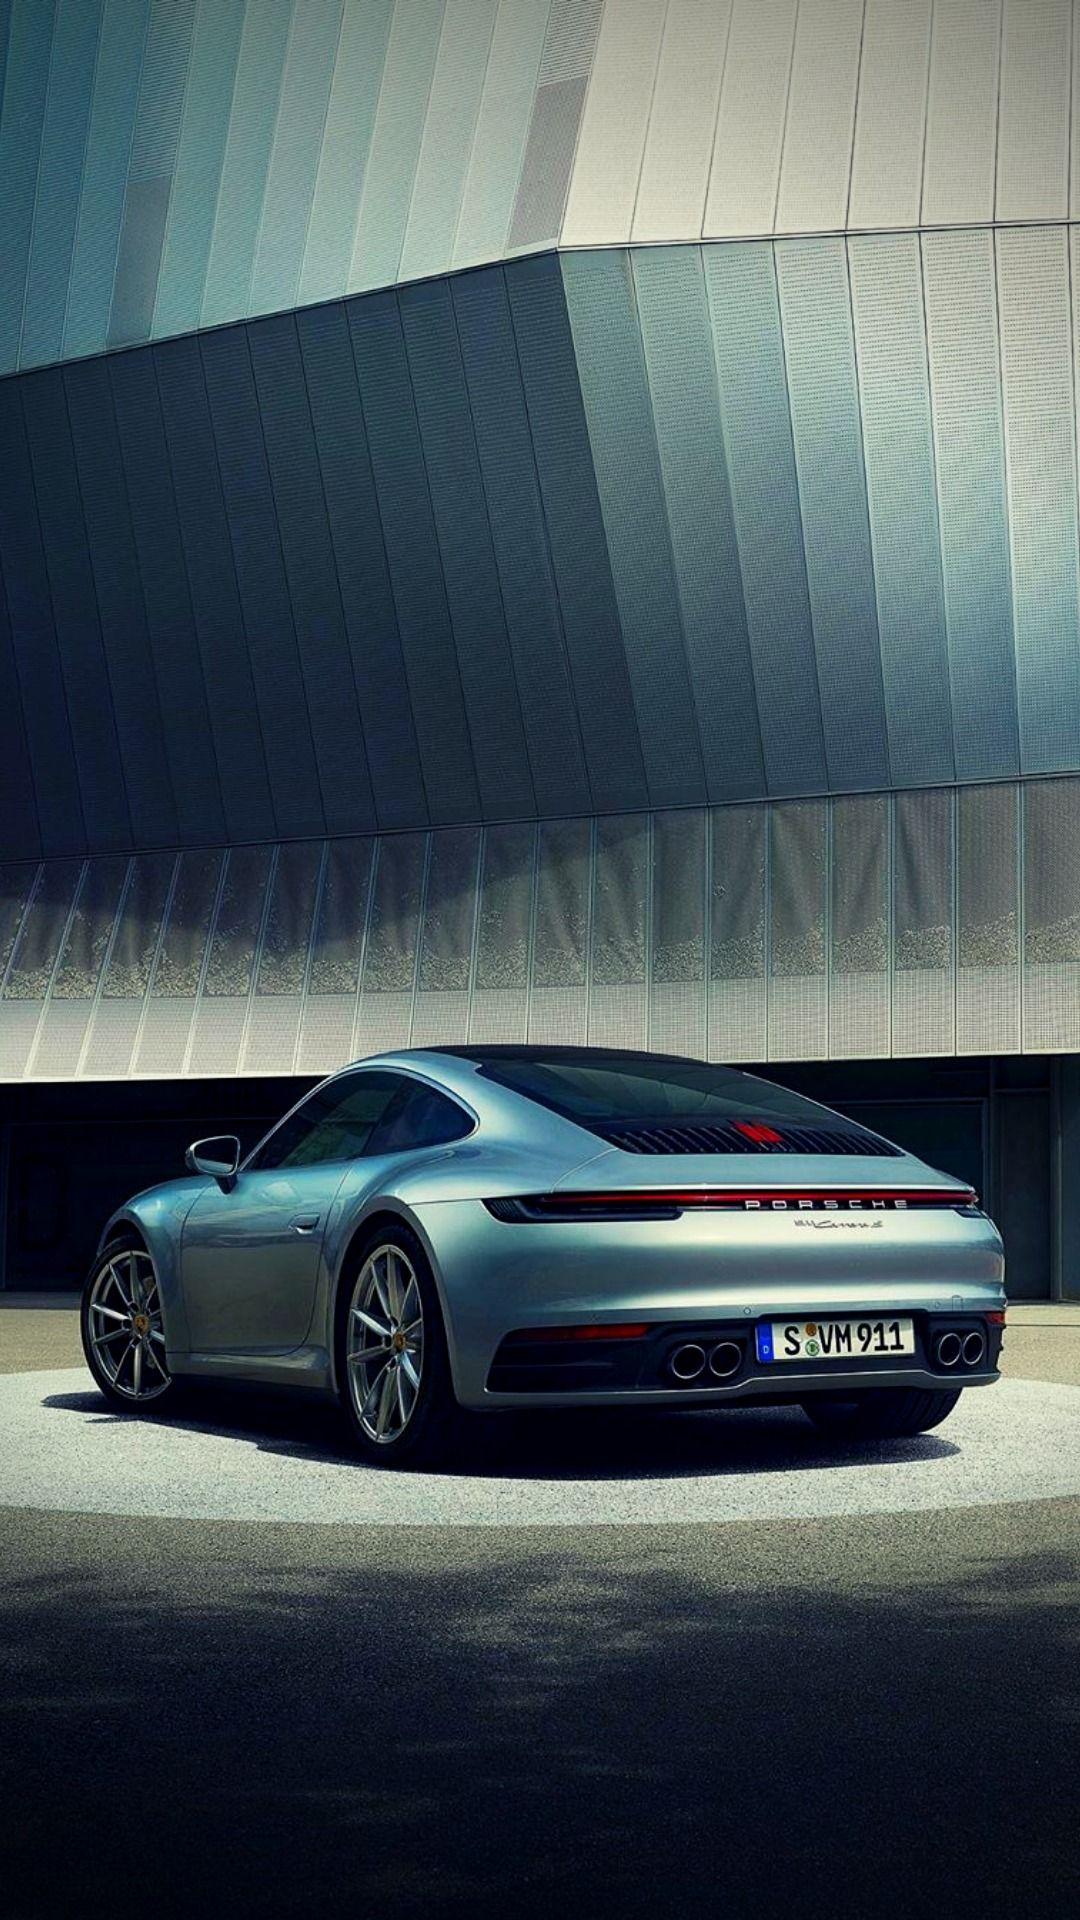 Porsche Iphone Wallpapers Wallpaper Cave